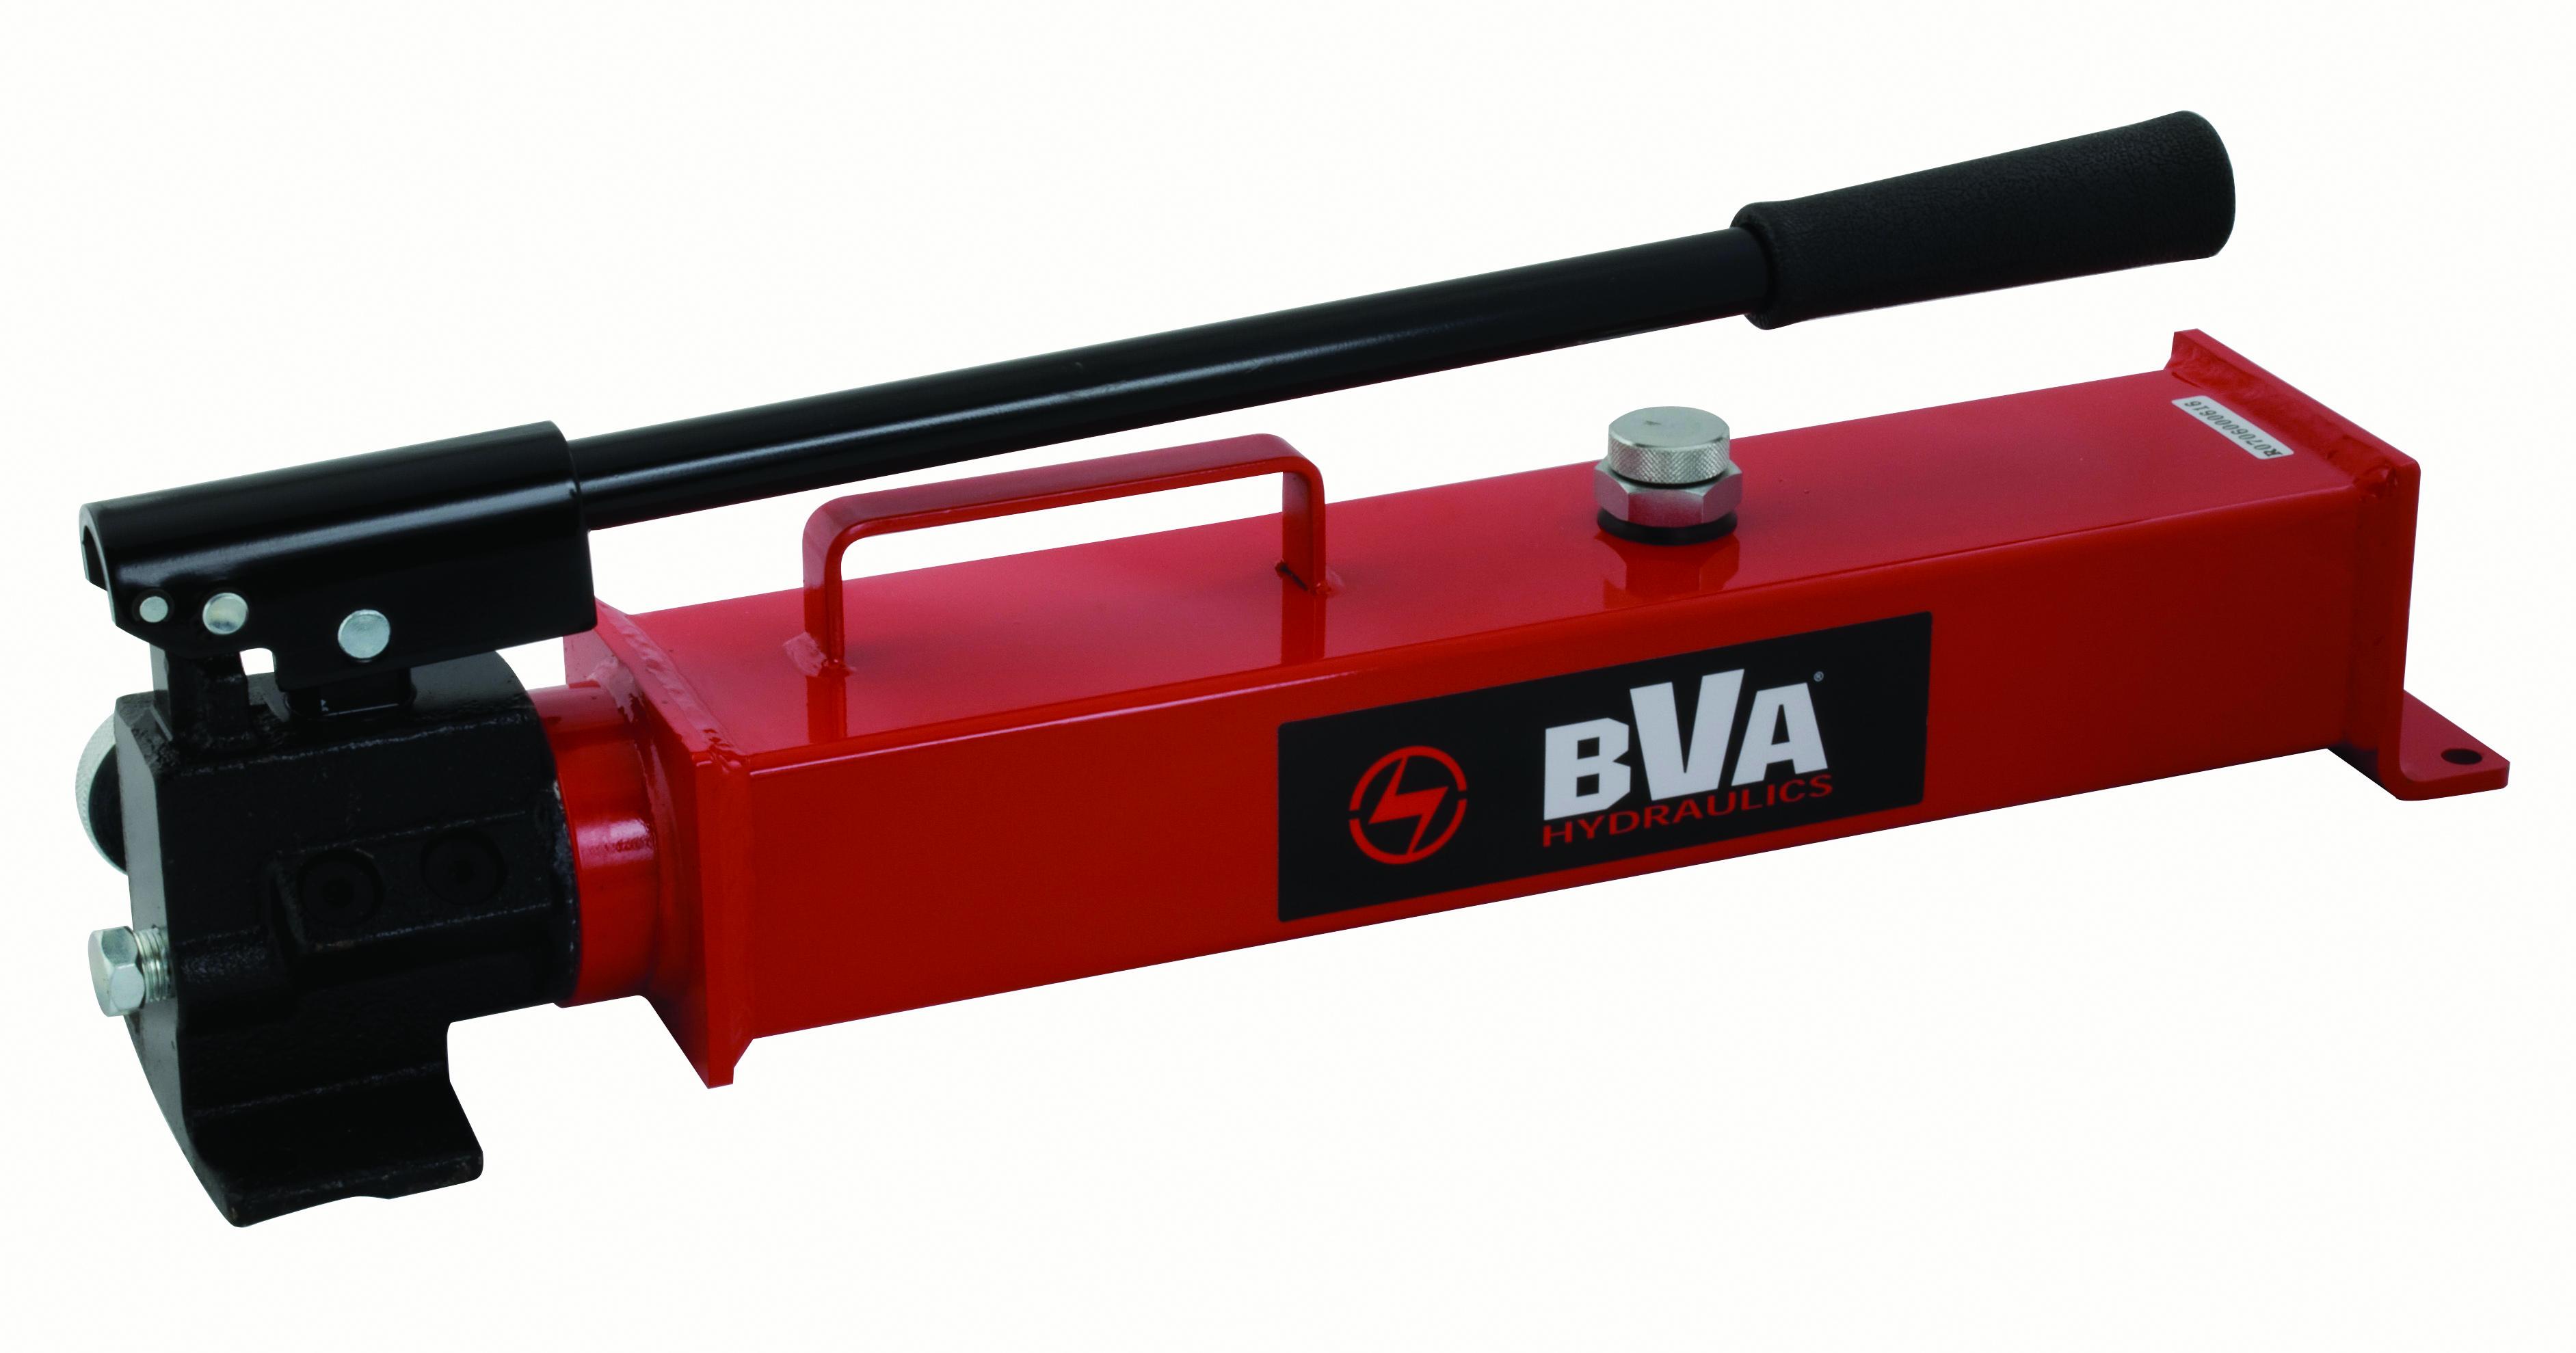 BVA hand pump